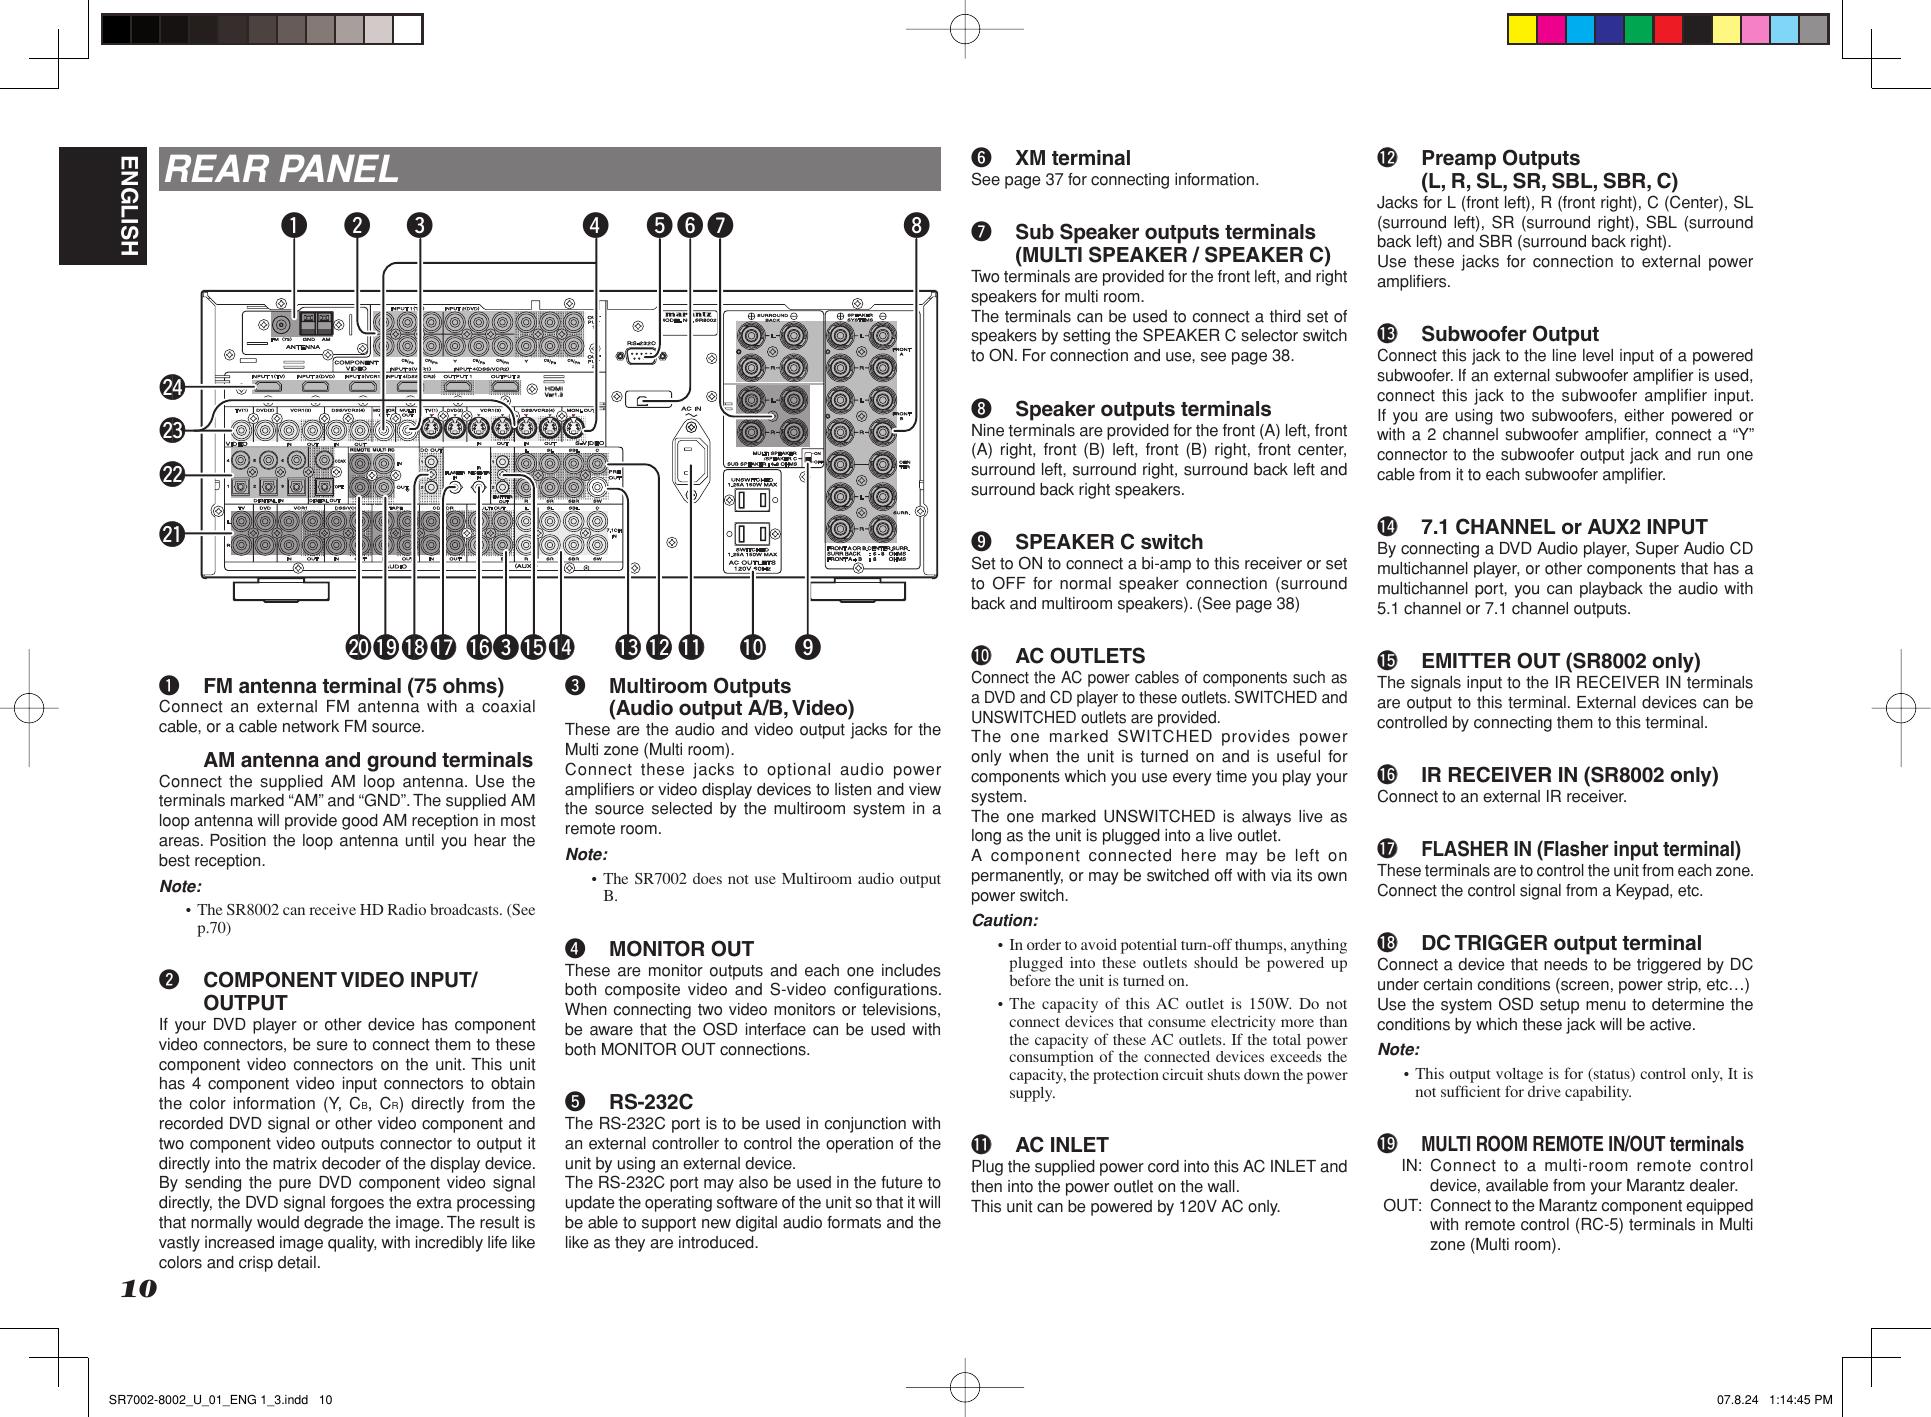 Marantz Sr7002 Manual Polaris Electric Terminal Fuse Circuit Board Genesis Ffi Ficht Virage Array Manualguide Honda 25hp Outboard Manuals Rh Whizenterprise Co Uk